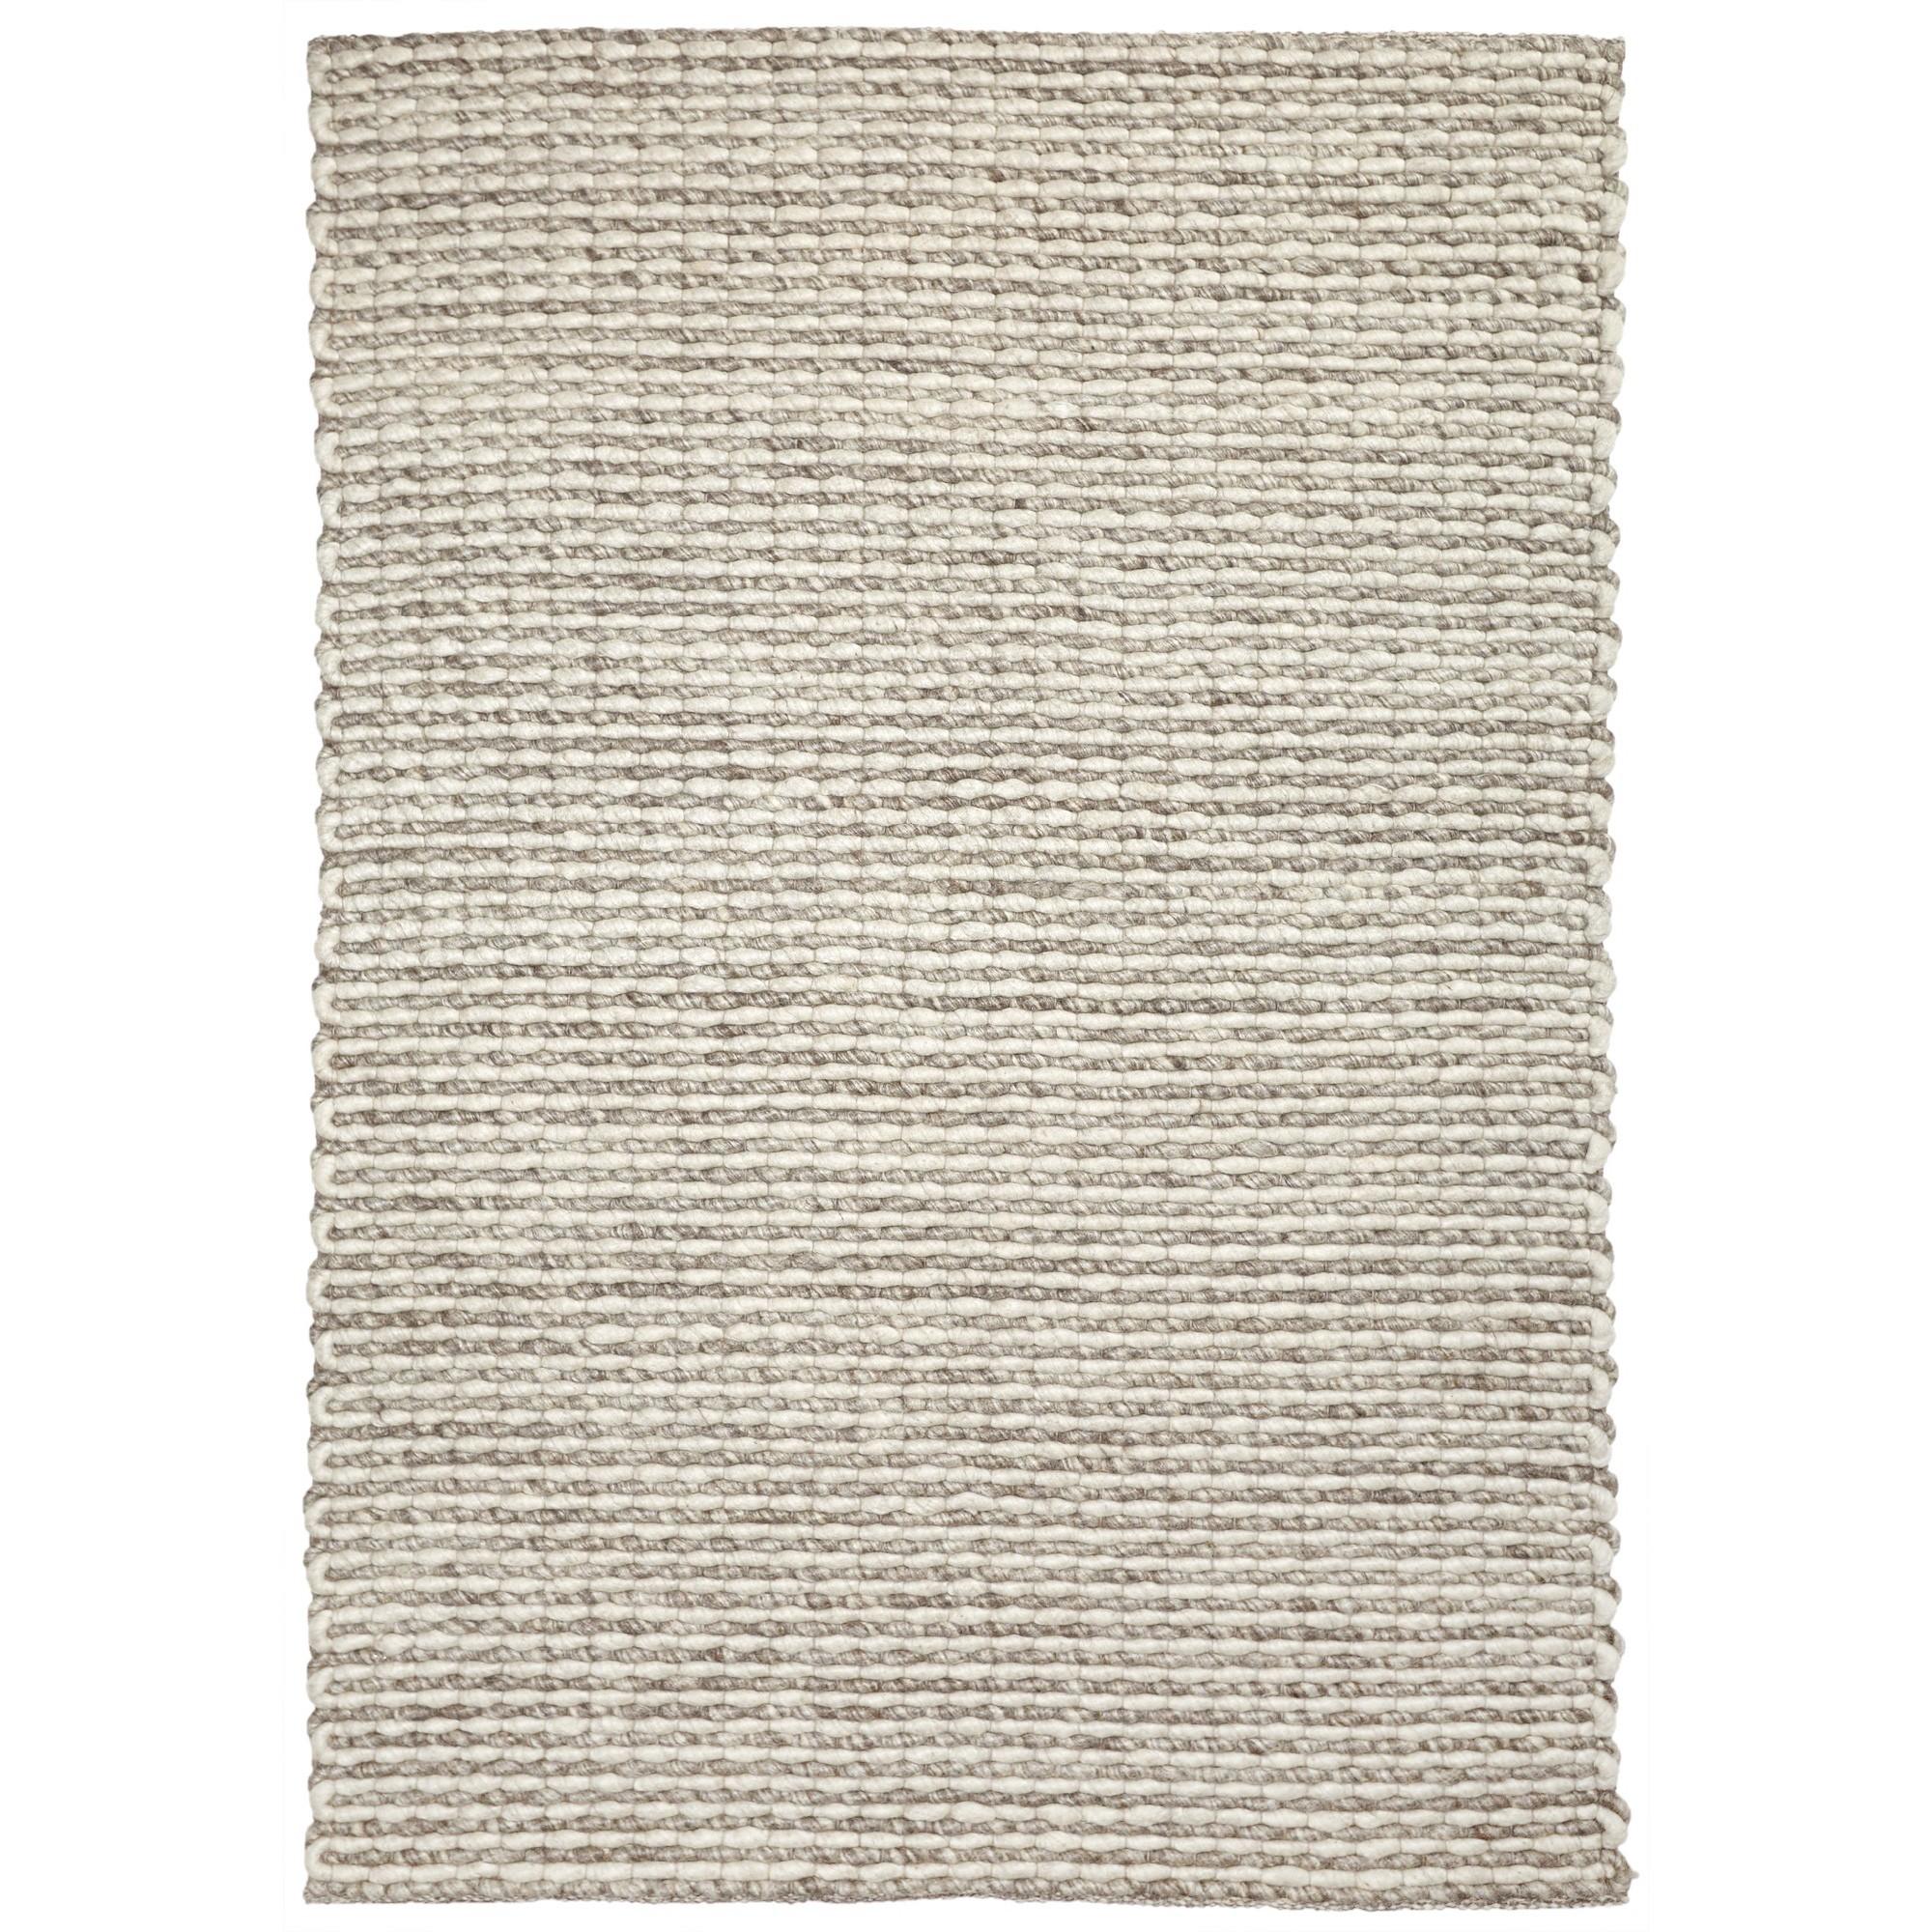 Lisbon Handwoven Wool Rug, 225x155cm, Ivory / Brown